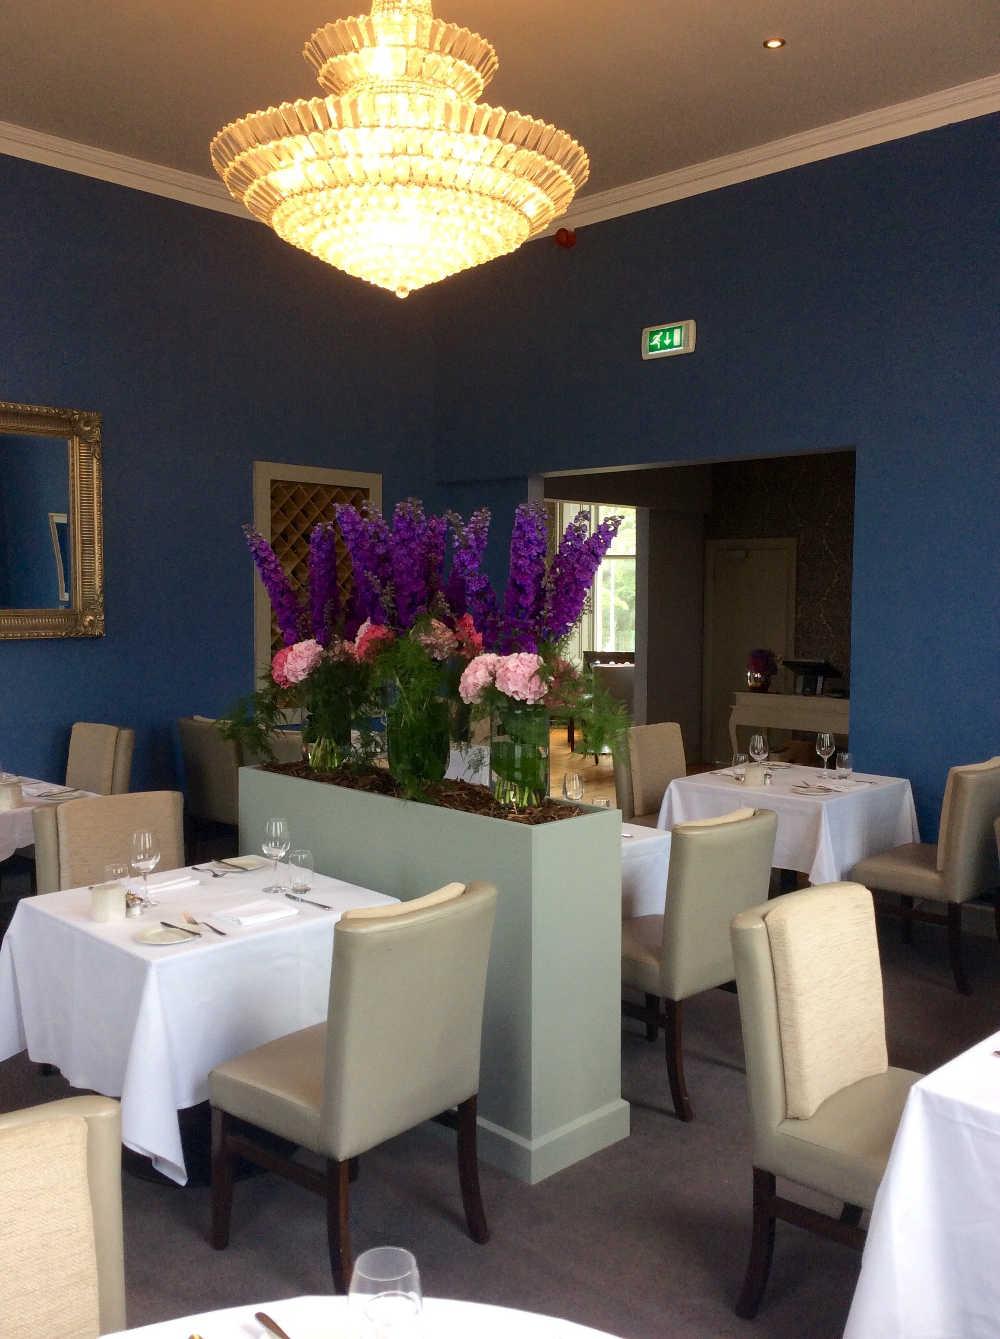 St George's Terrace Restaurant, Carrick-on-Shannon, Co Leitrim